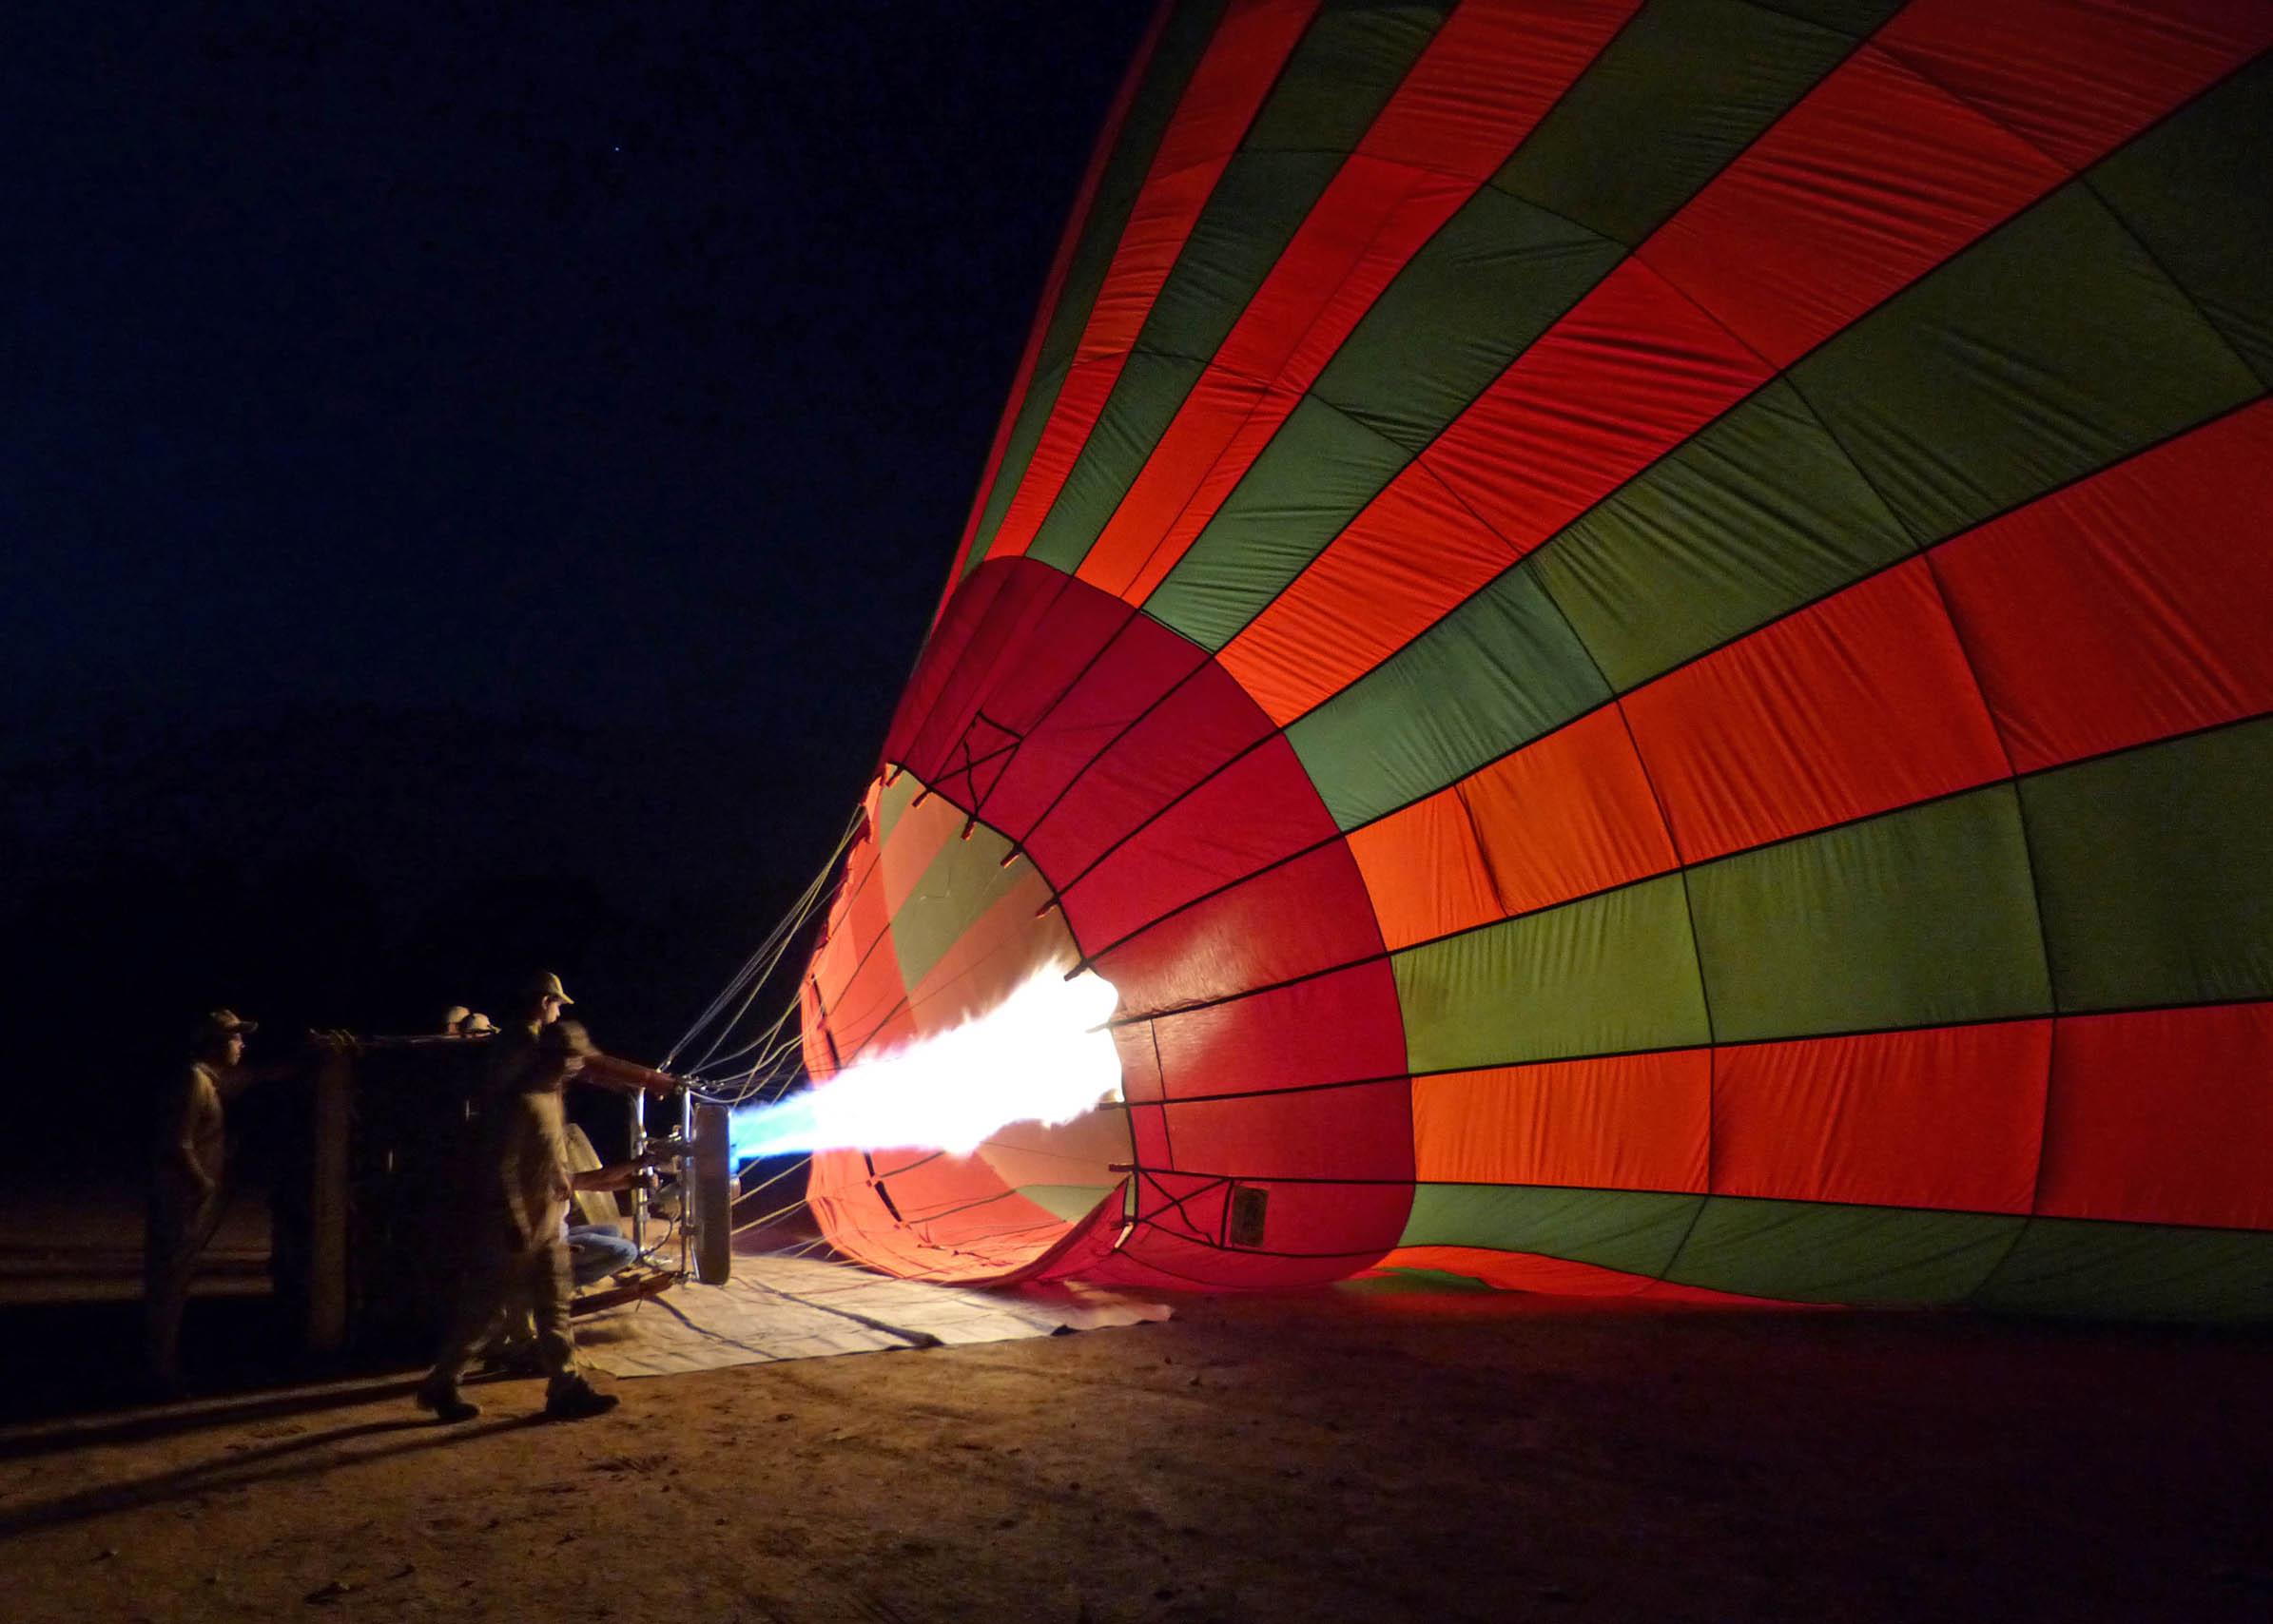 Men inflating a hot air balloon